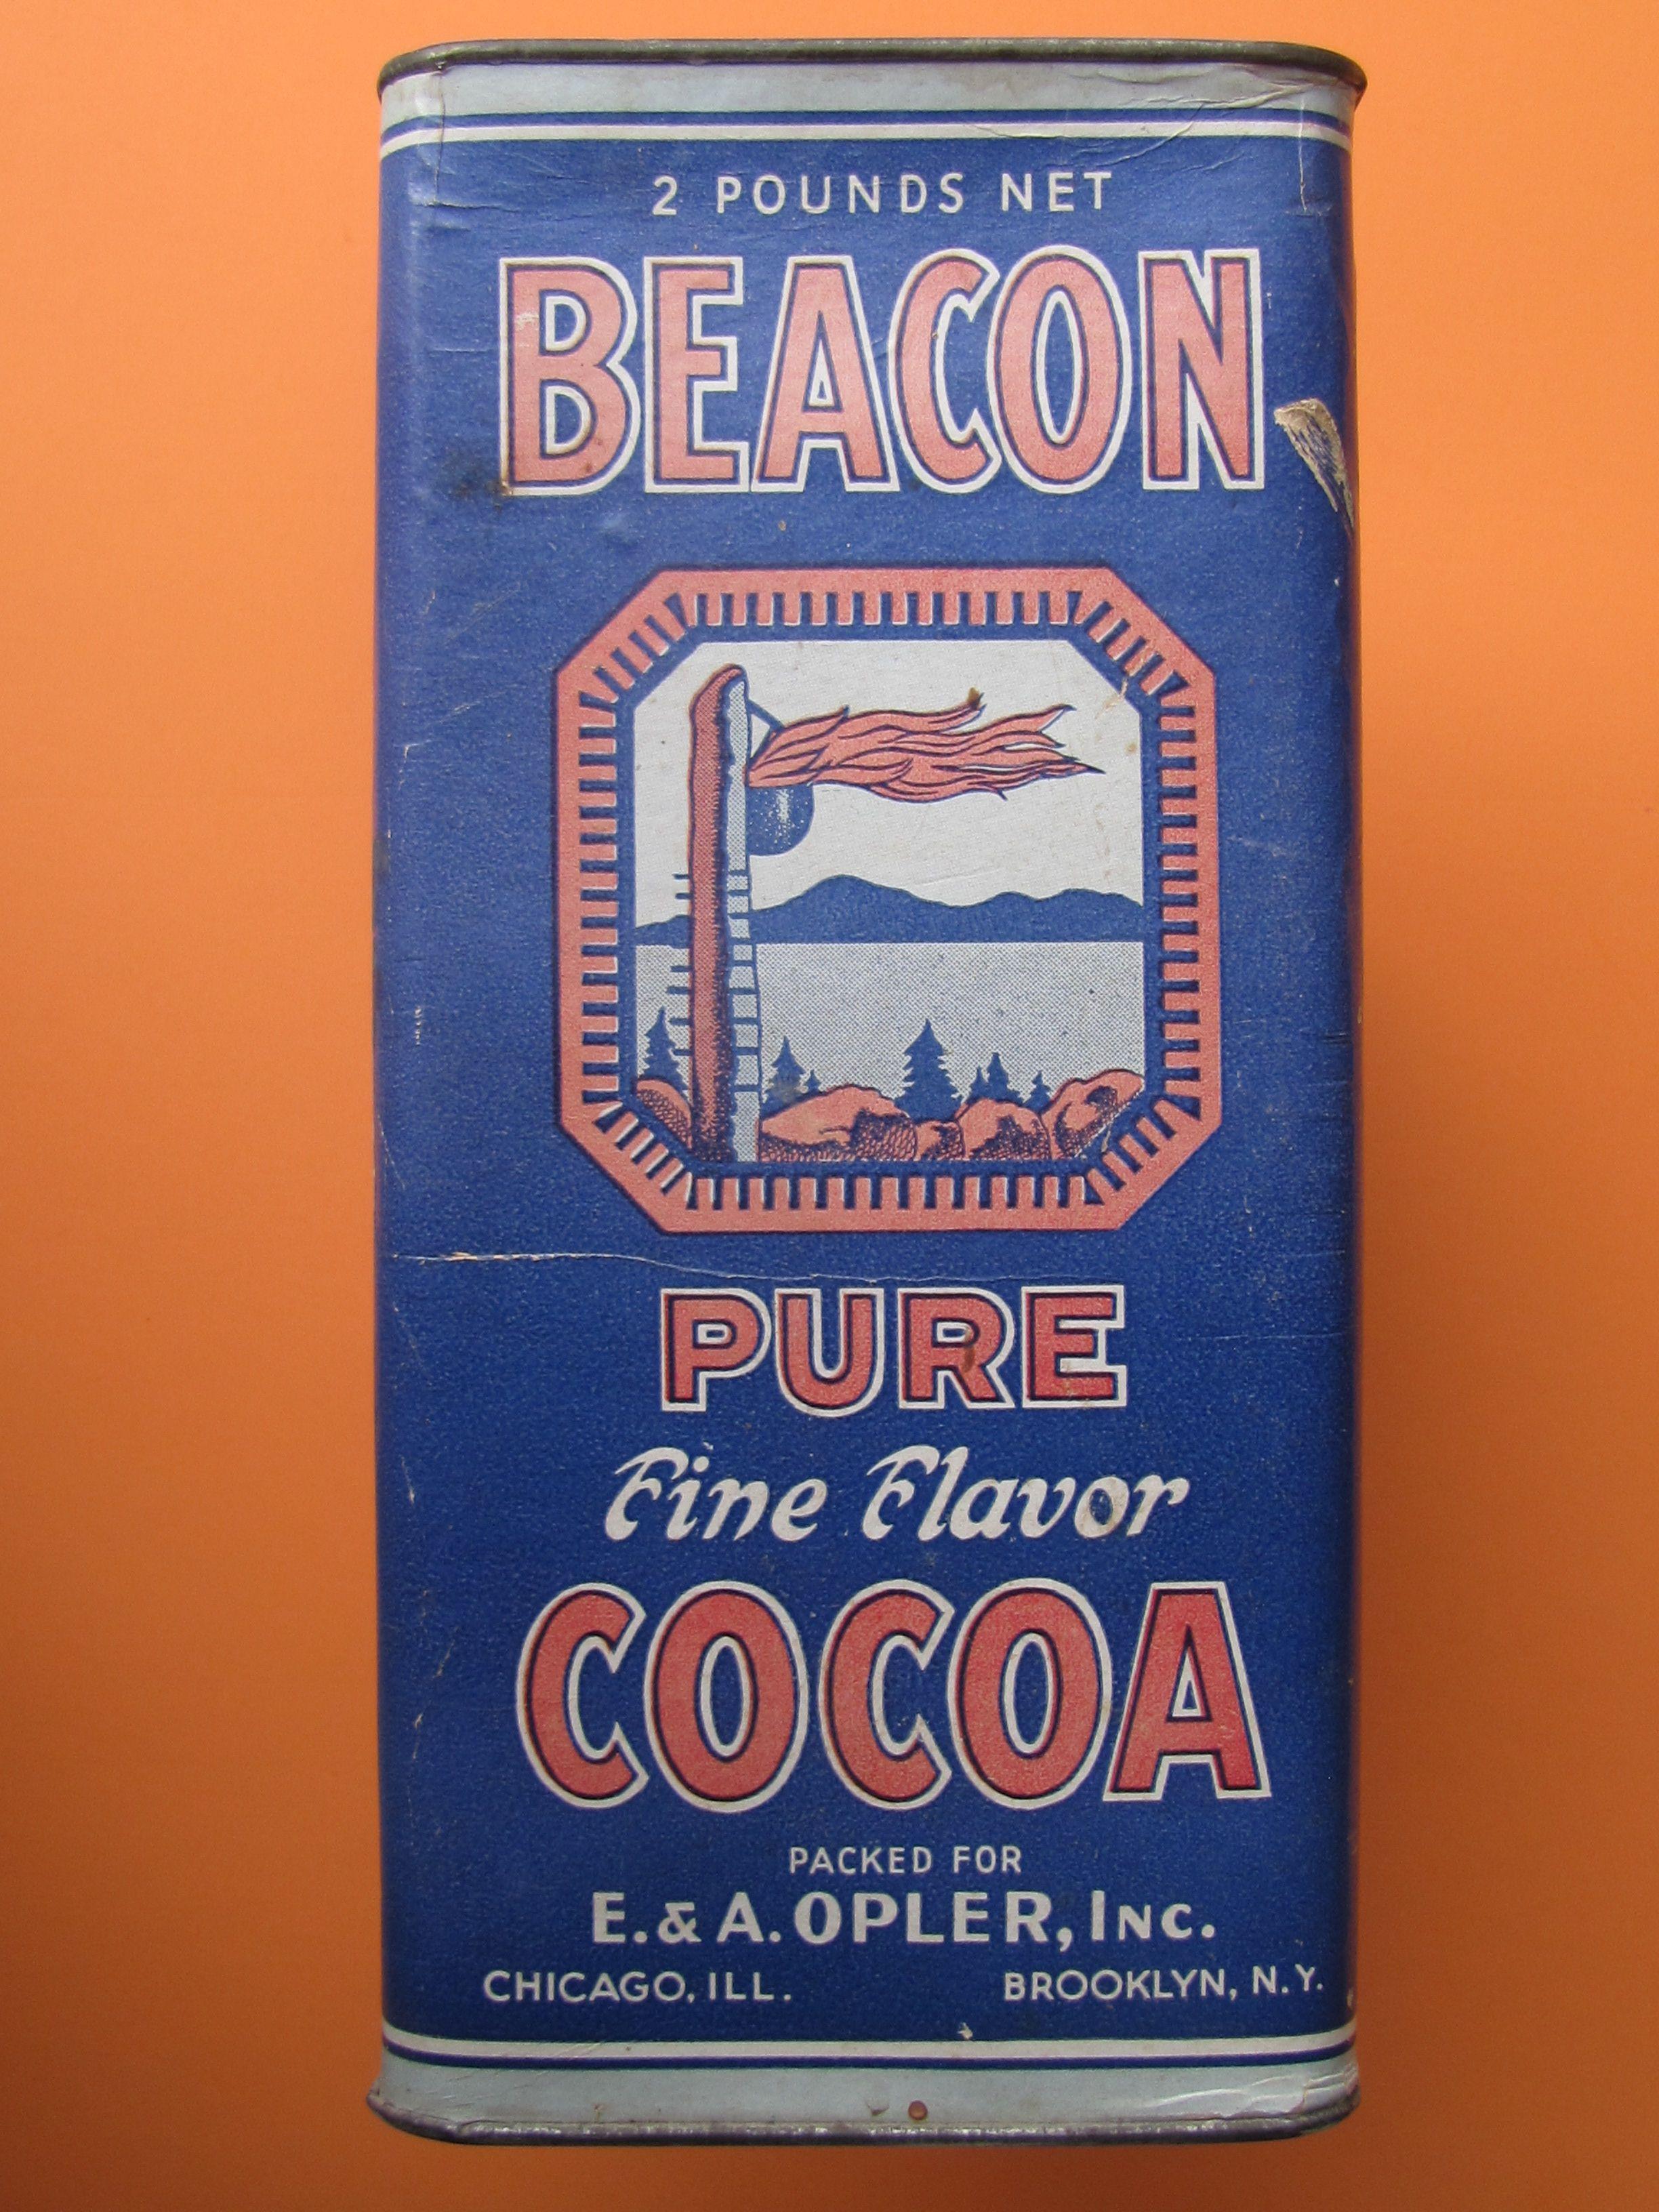 Beacon cocoa 1920s my collection vintage coffee tea